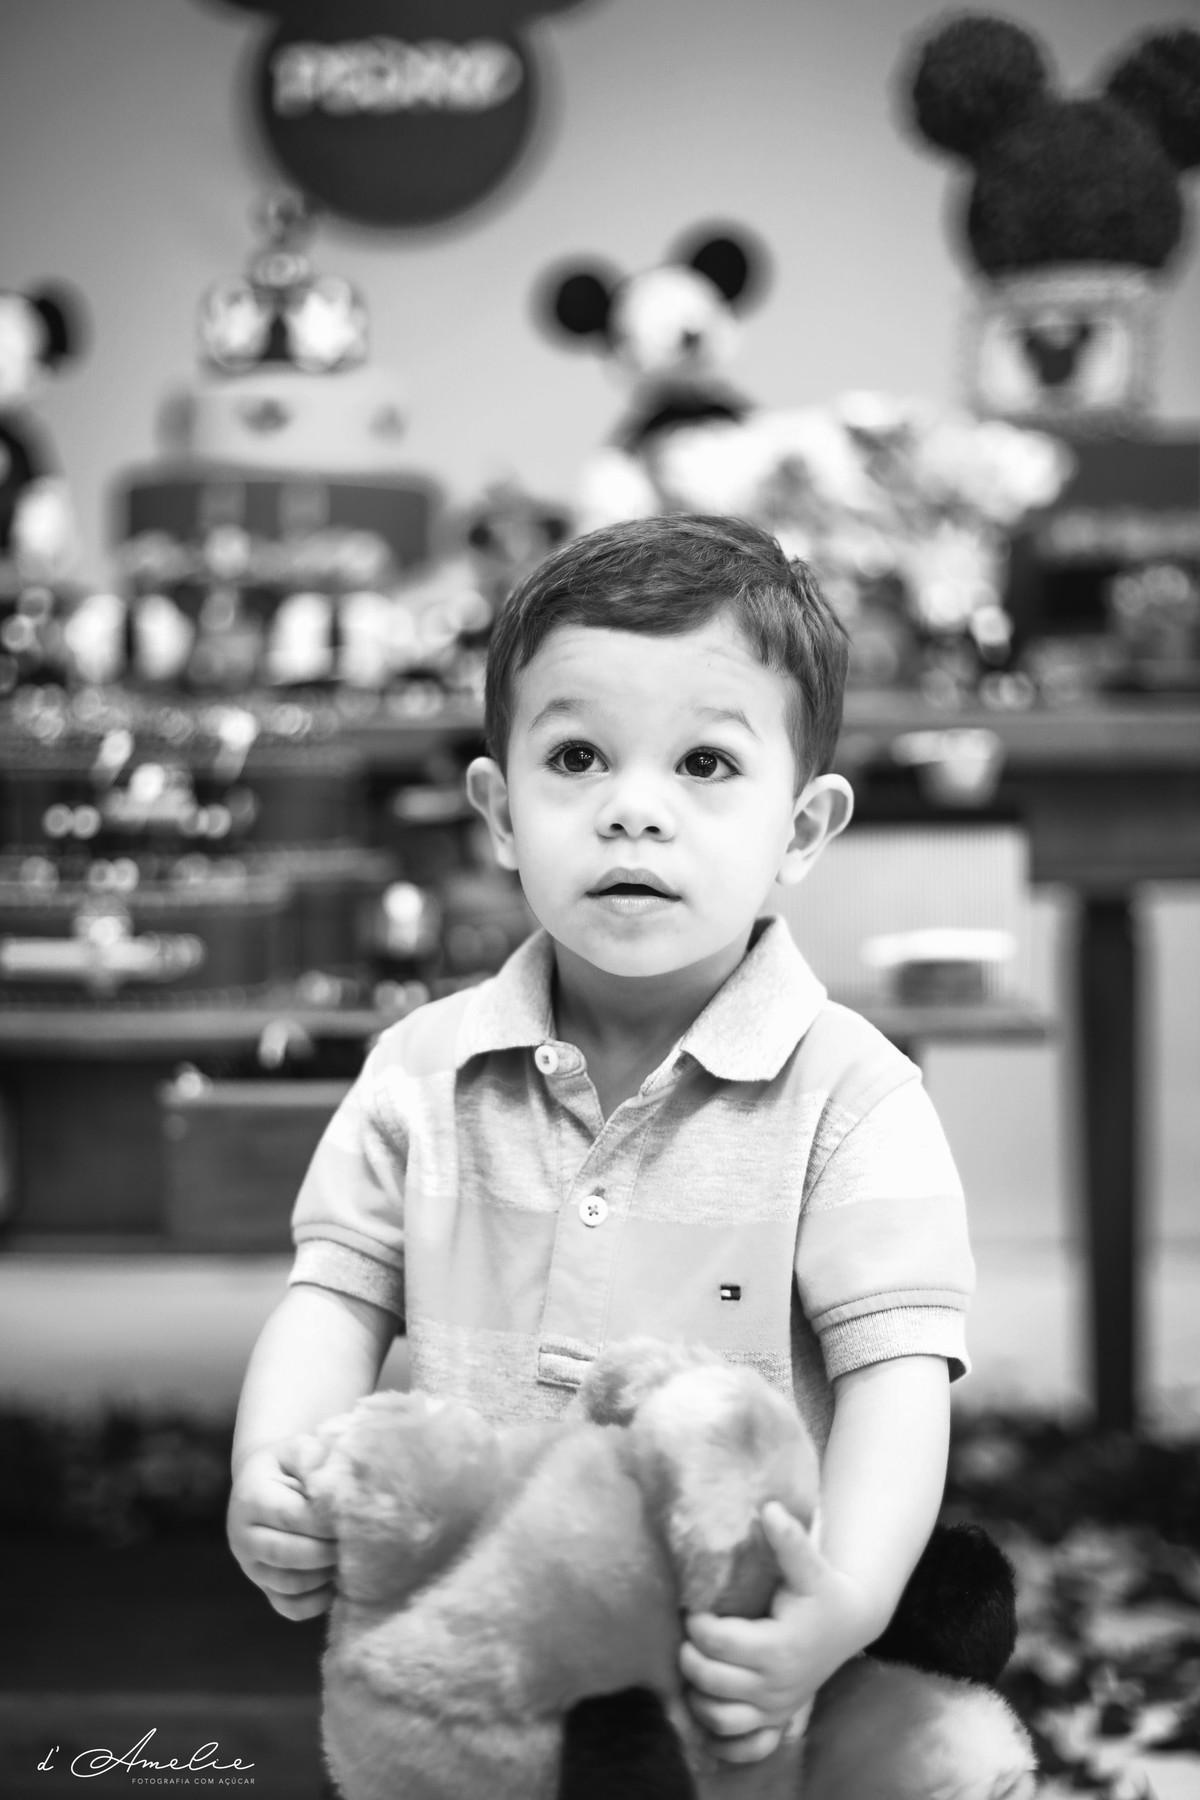 Zappteen buffet infantil Bauru, foto, fotografa, fotografo em Bauru